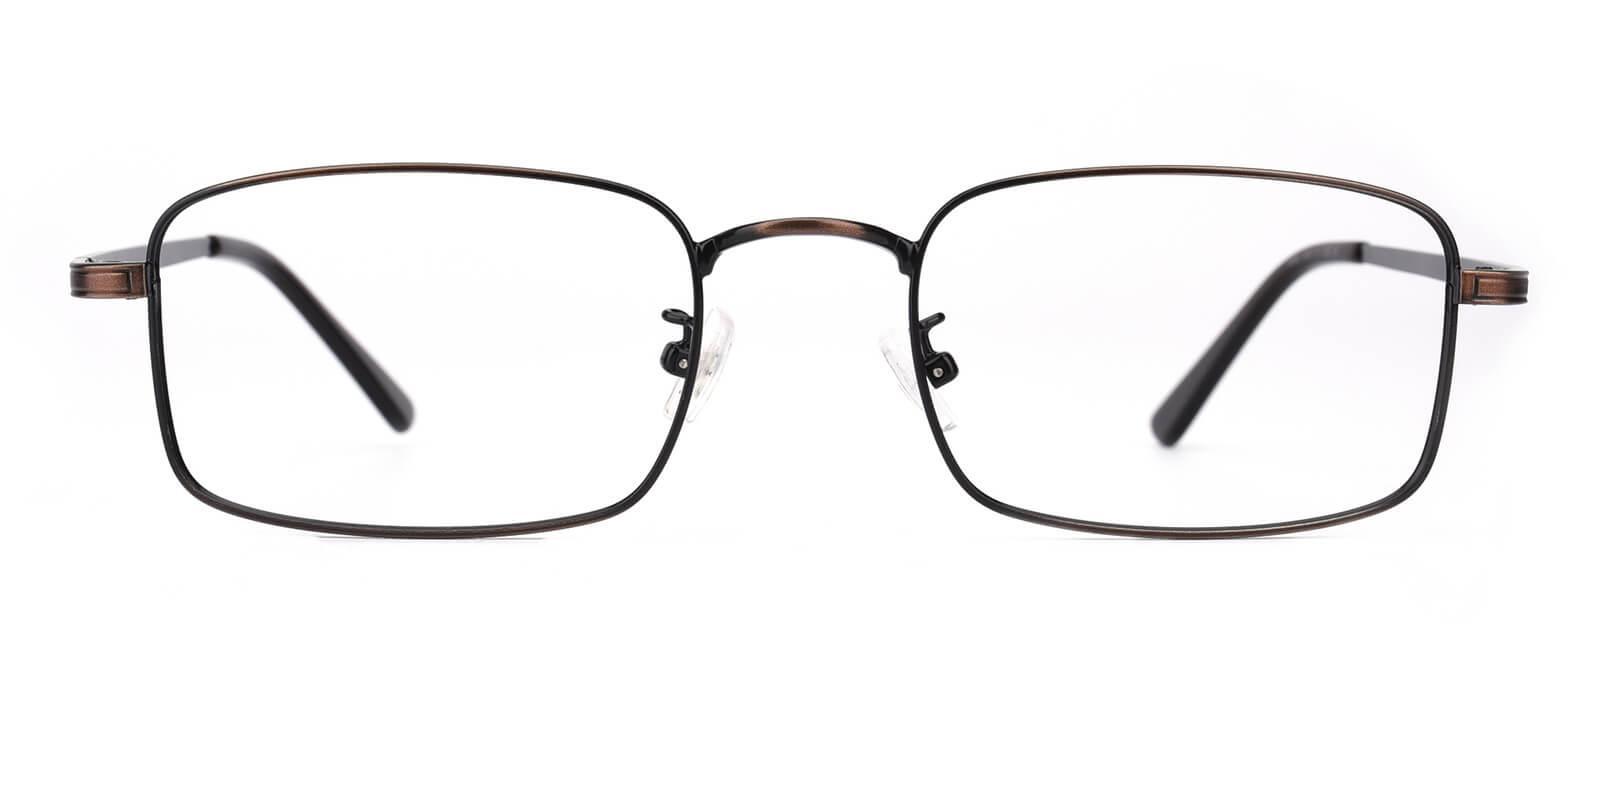 Edmonton-Brown-Rectangle-Metal-Eyeglasses-additional2